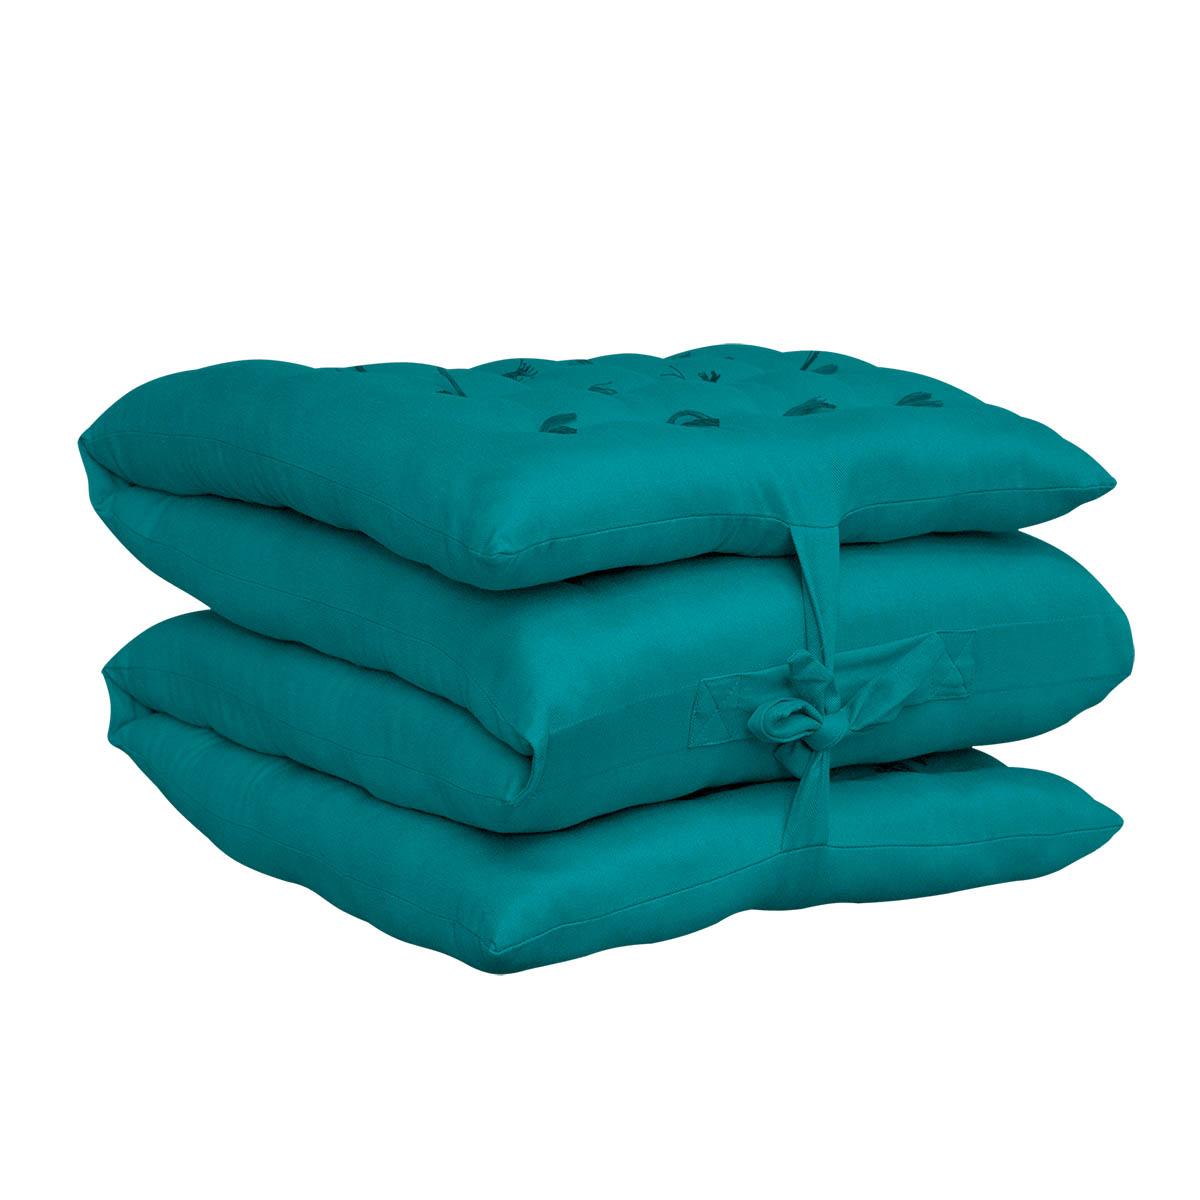 Puff decorativo Mil Folhas Tecido Sarja Peletizada Azul Tiffany